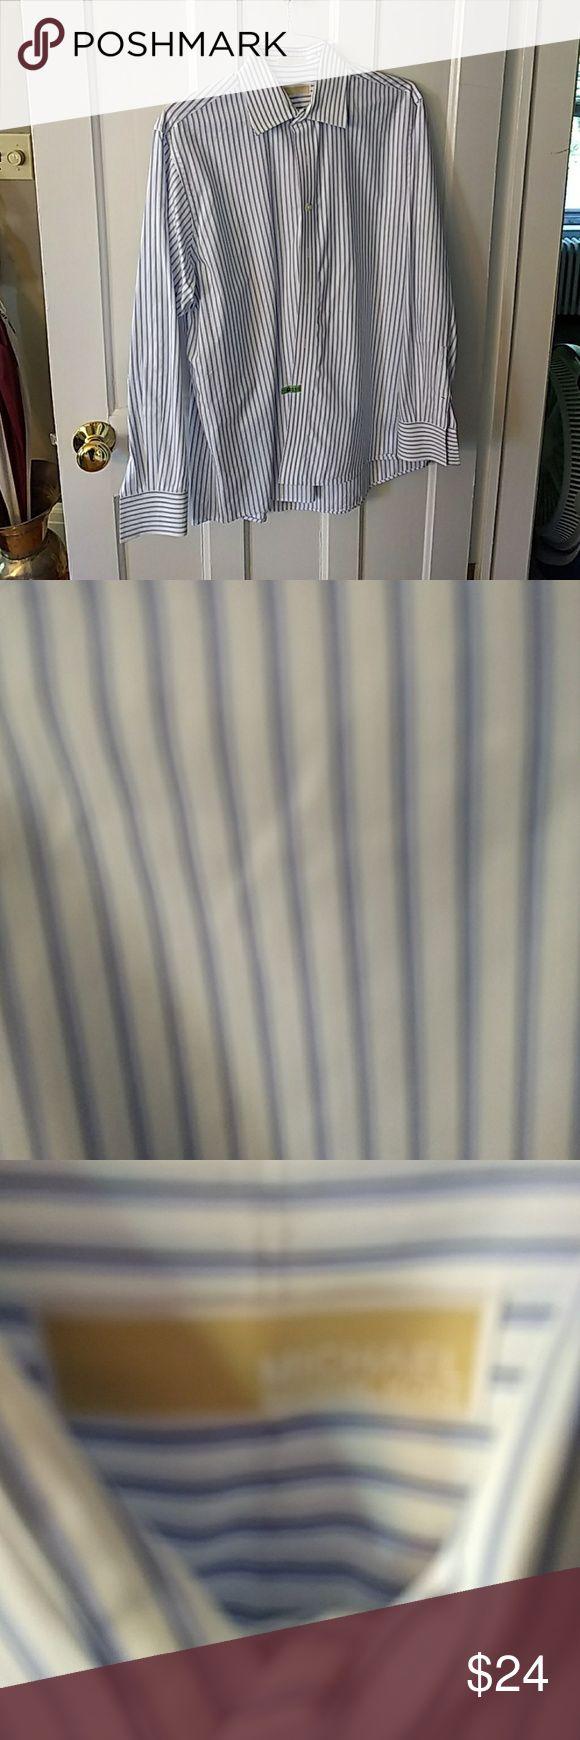 Michael Kors Men's shirt 2 shades of blue stripes makes this Michael Kors shirt amazing, all Cotton, 16 1/2 X 35 or Large MICHAEL Michael Kors Shirts Dress Shirts